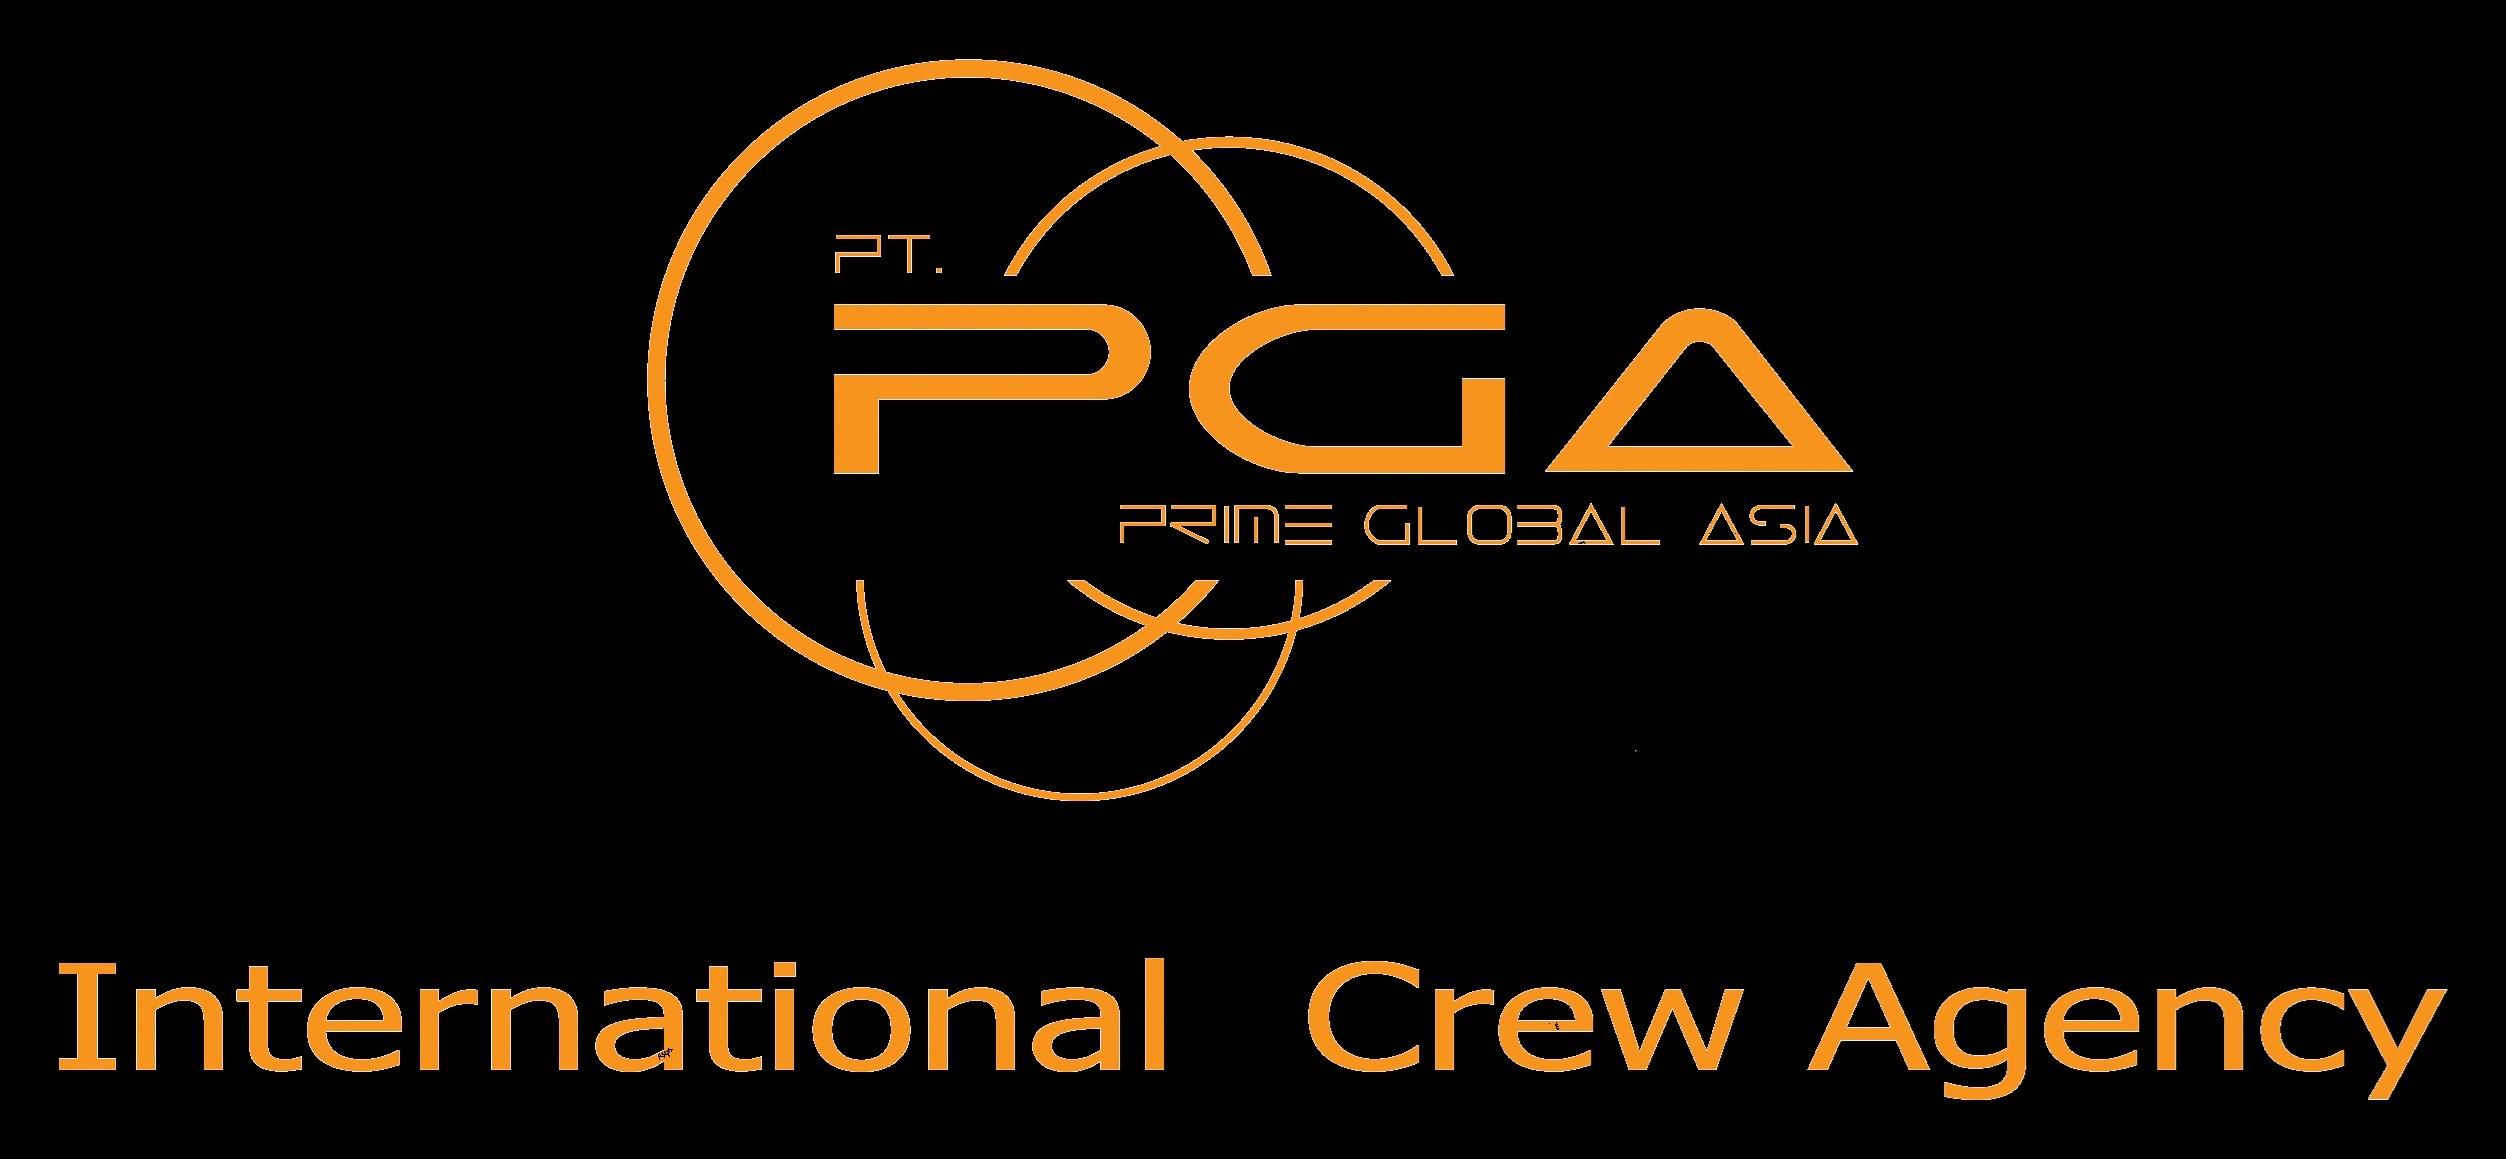 PT. Prime Global Asia